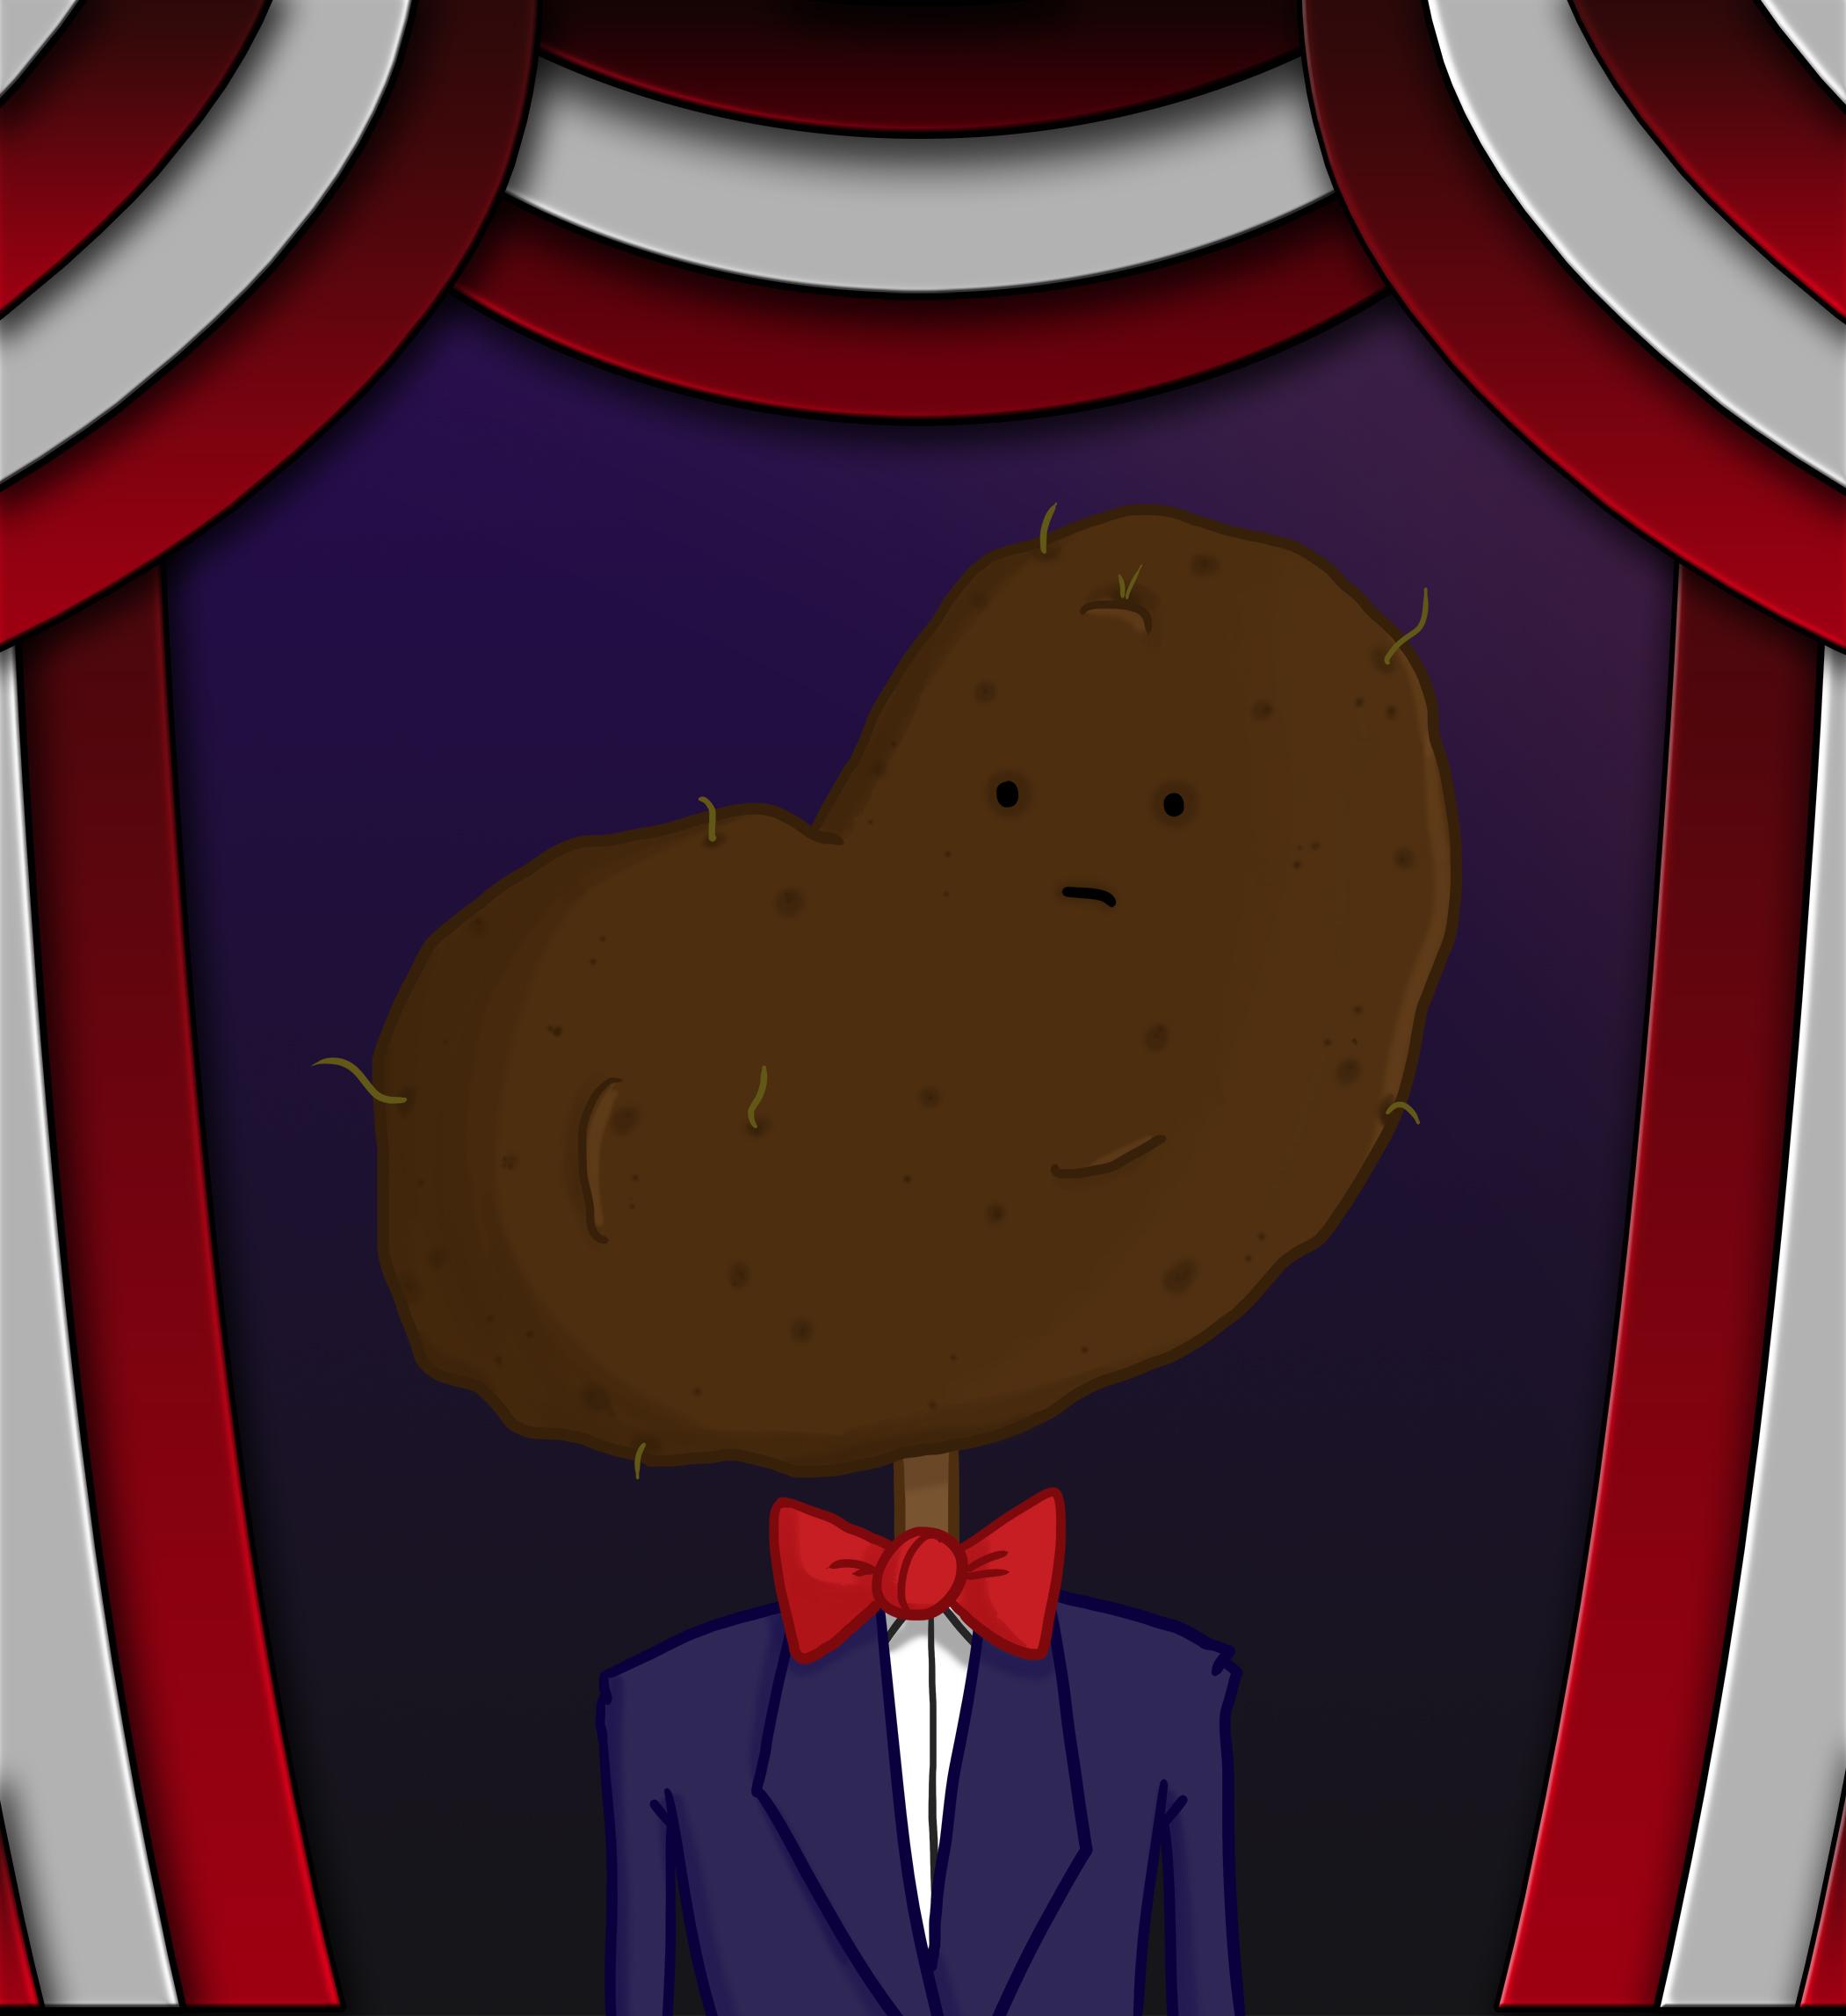 Potatohead.jpg